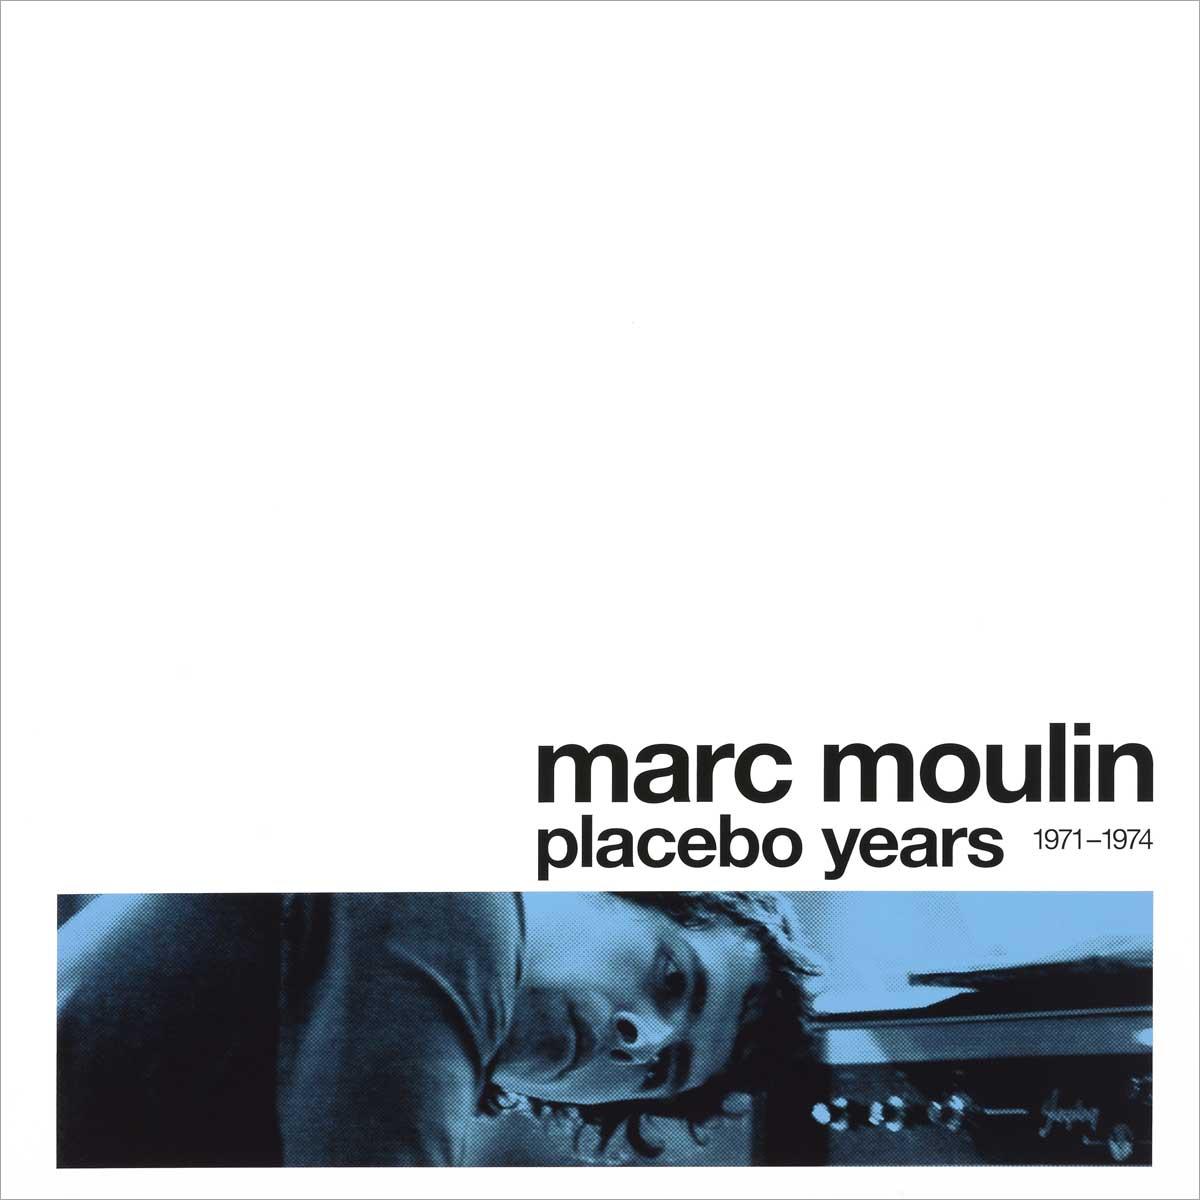 цена на Марк Мулен Marc Moulin. Placebo Years 1971-1974 (LP)